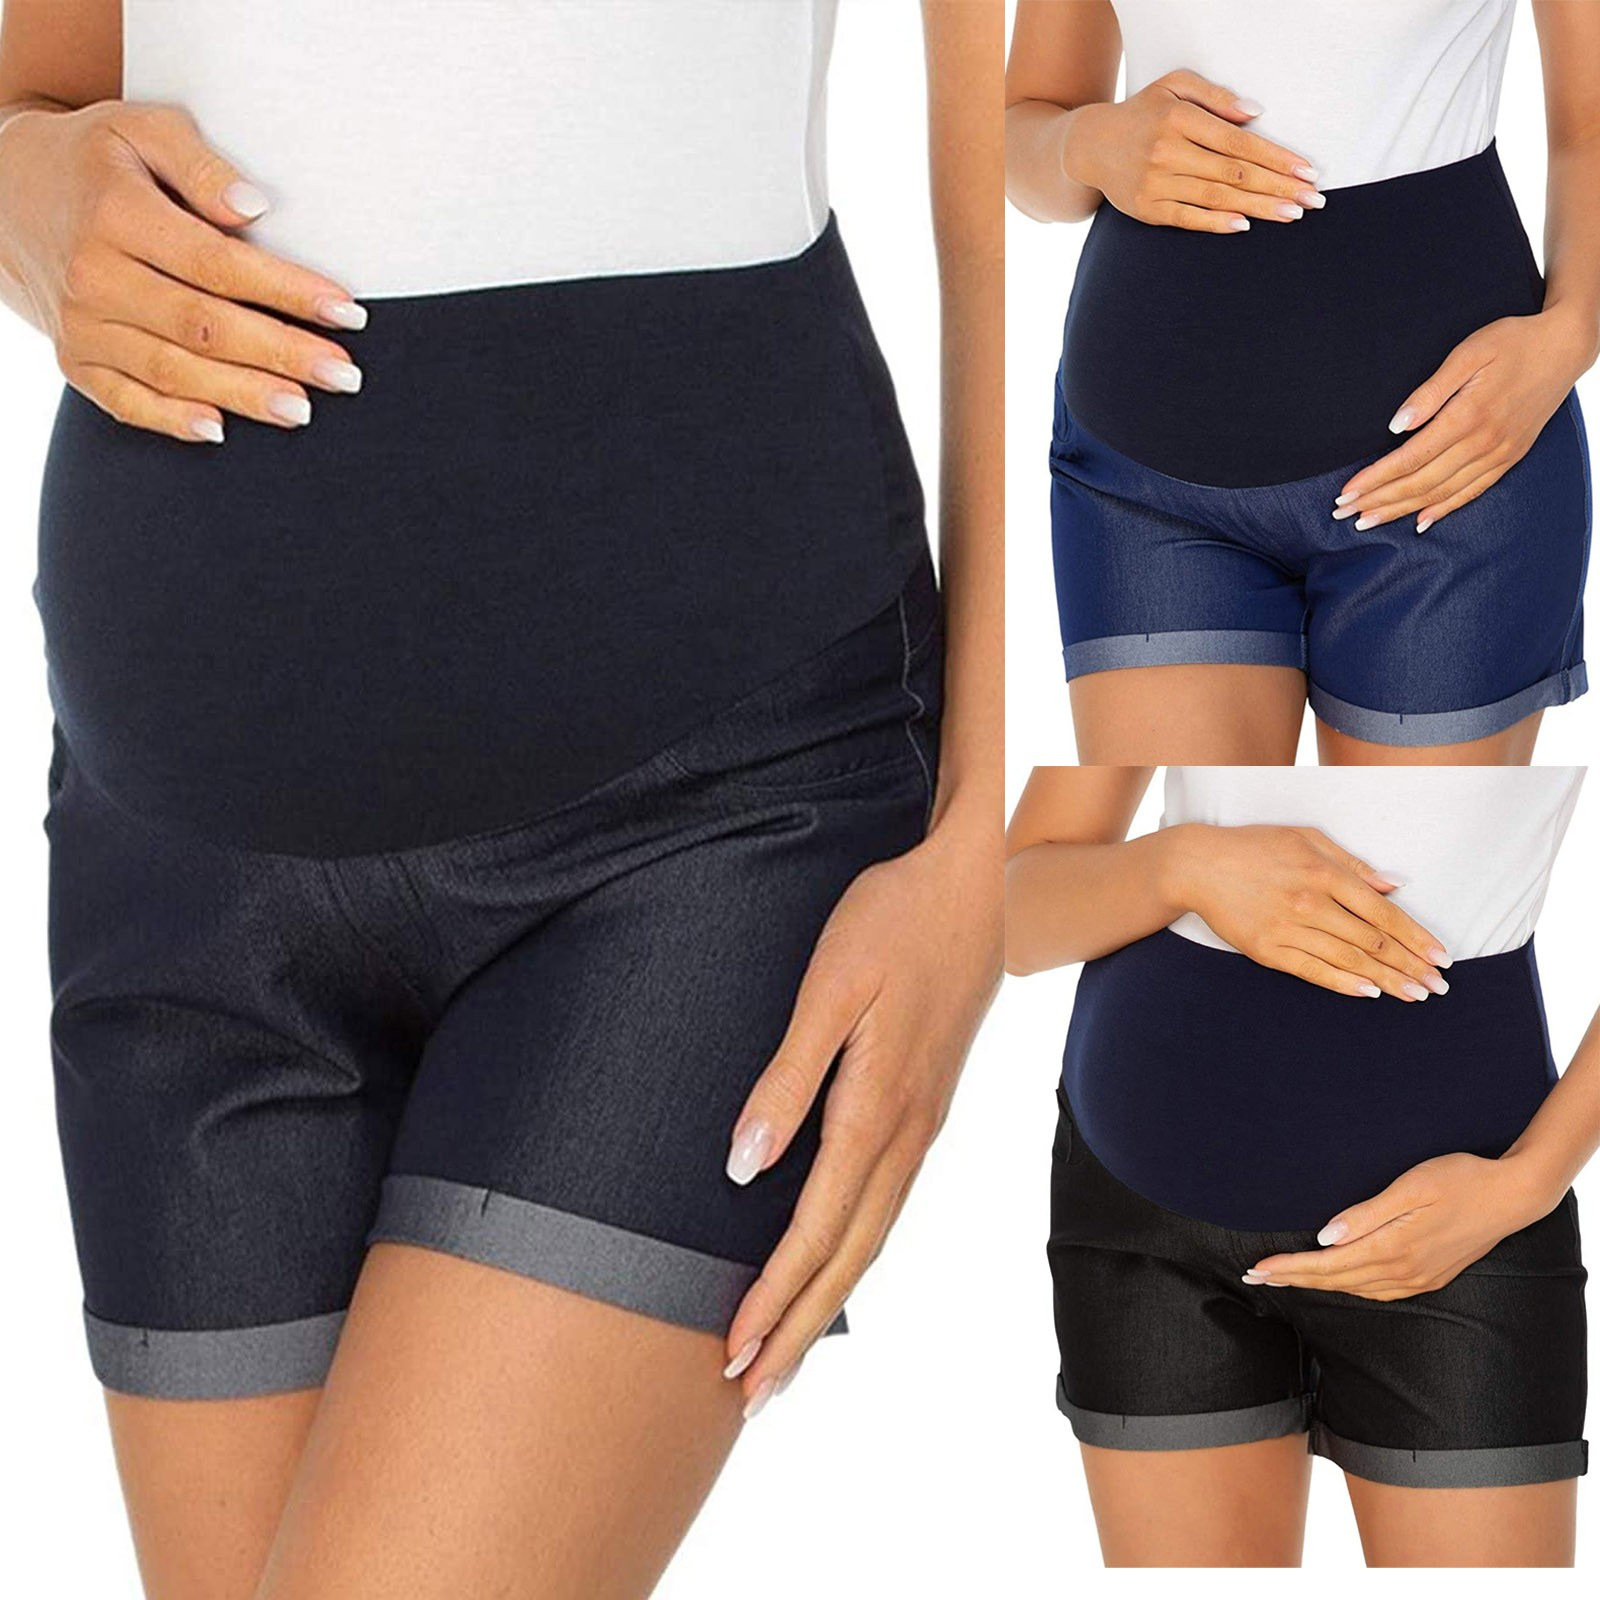 Maternity Short Summer Jeans Pregnant Denim Jean Mommy Clothing Pregnancy Jeans Maternity clothes Pregnancy Shorts джинсы